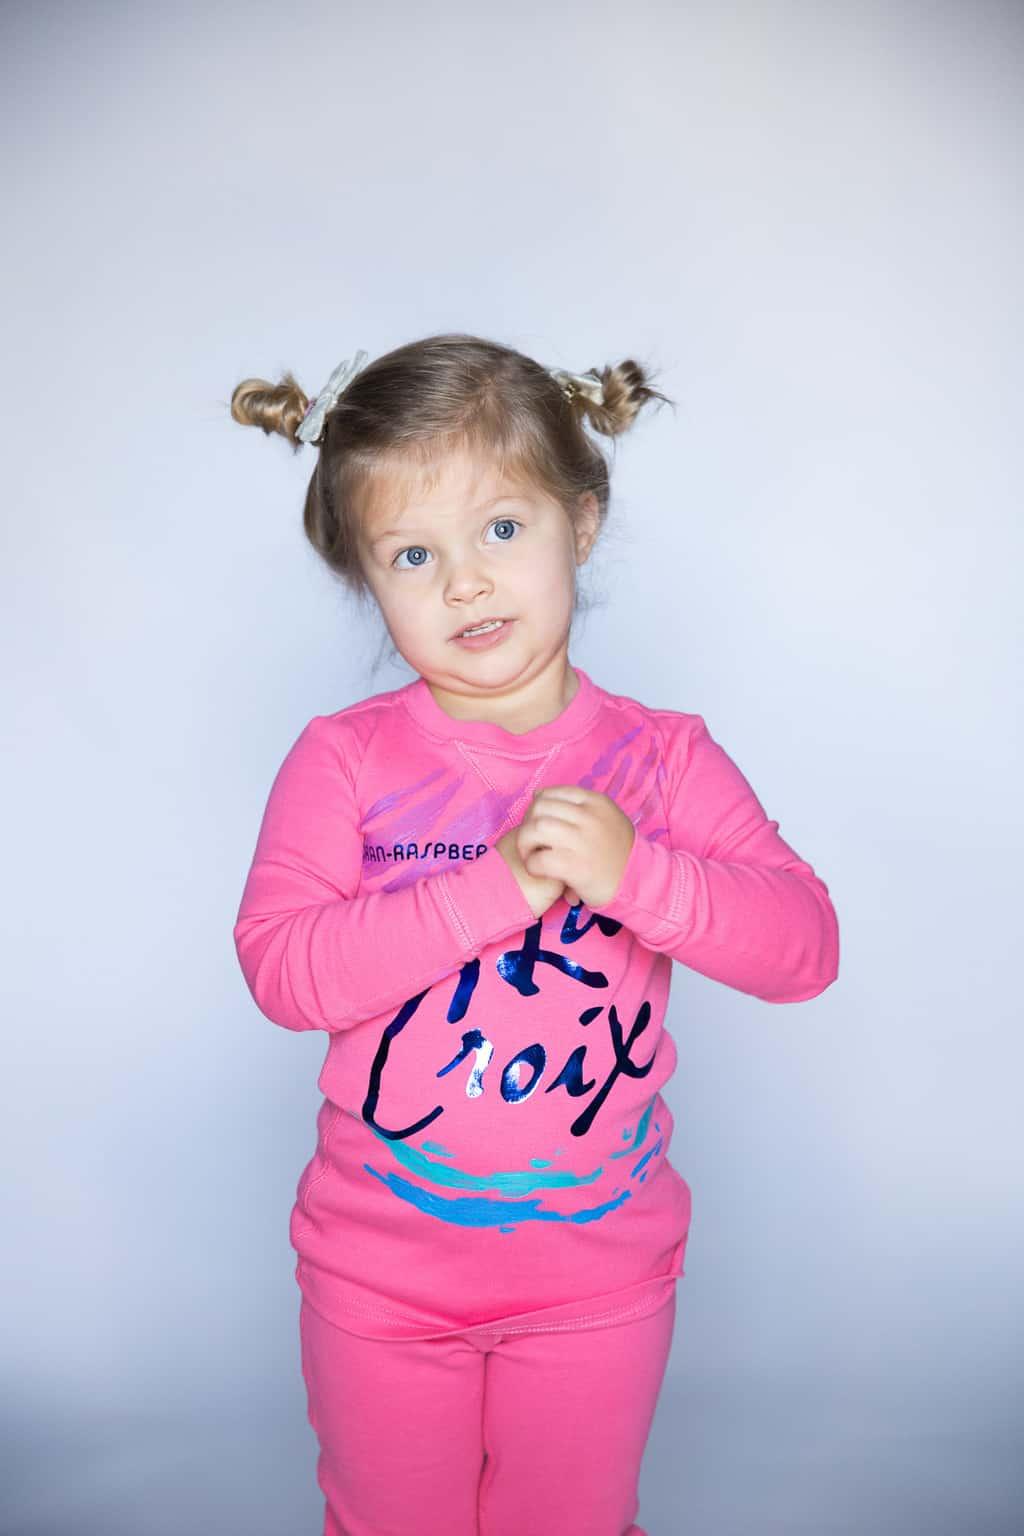 La Croix costume pink pajamas and iron-on tutorial at TaylorMadeCreates.com